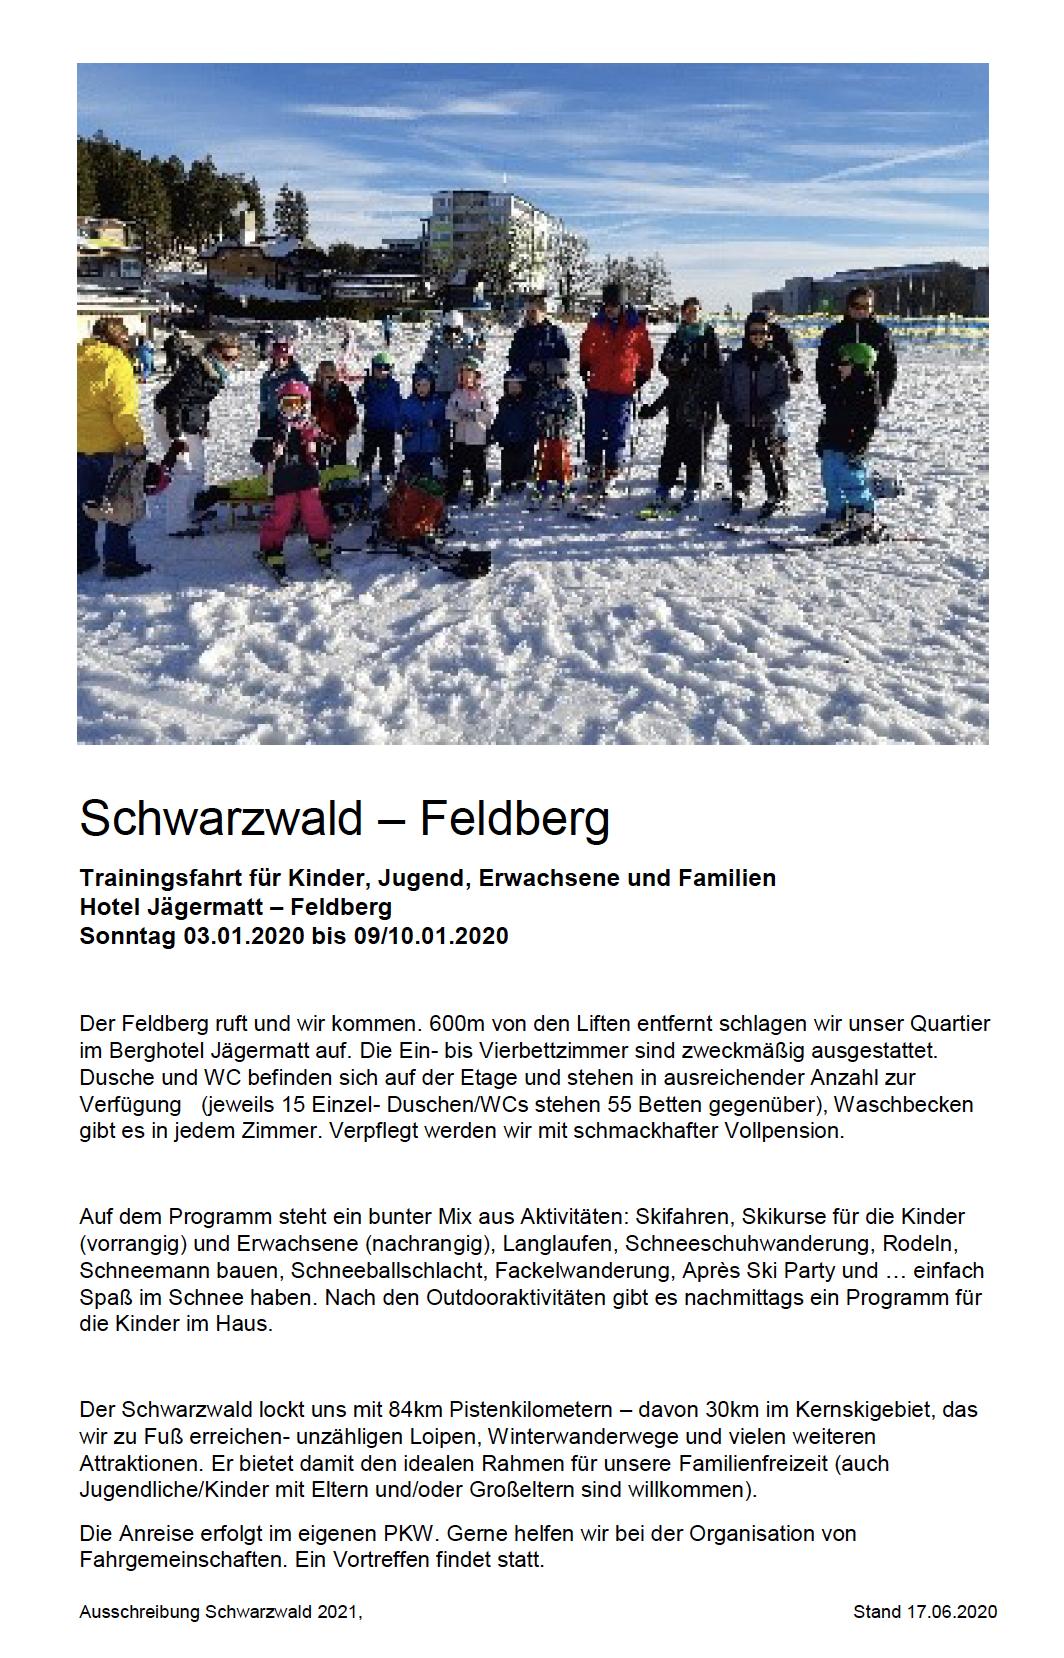 Reiseausschreibung 2021 Schwarzwald-Fahrt